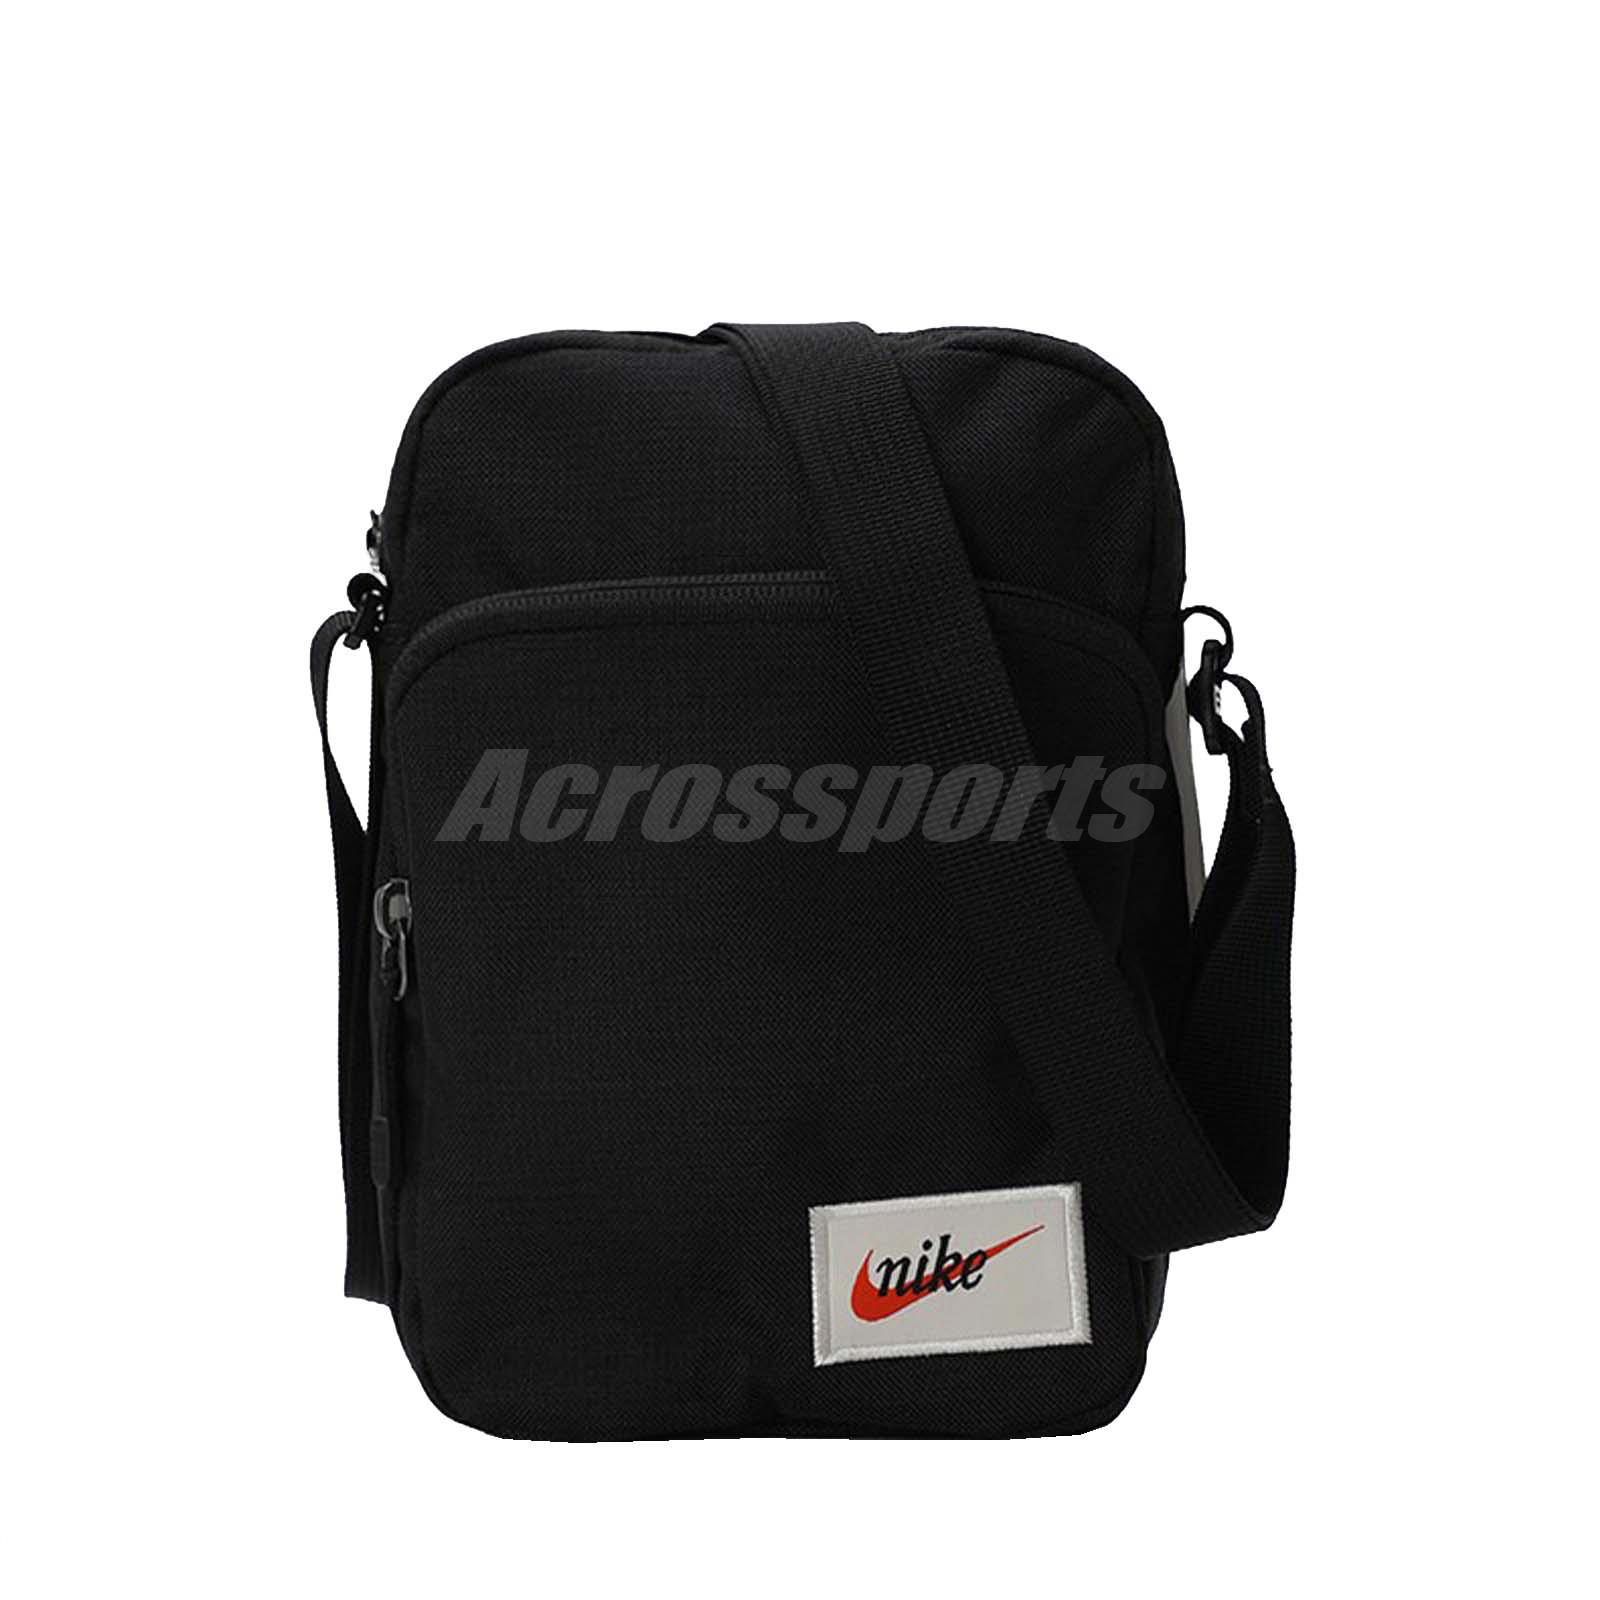 ed287dc9c24 Details about Nike Heritage Smit Label Mini Messenger Bag Swoosh Running  Gym Black BA5809-010